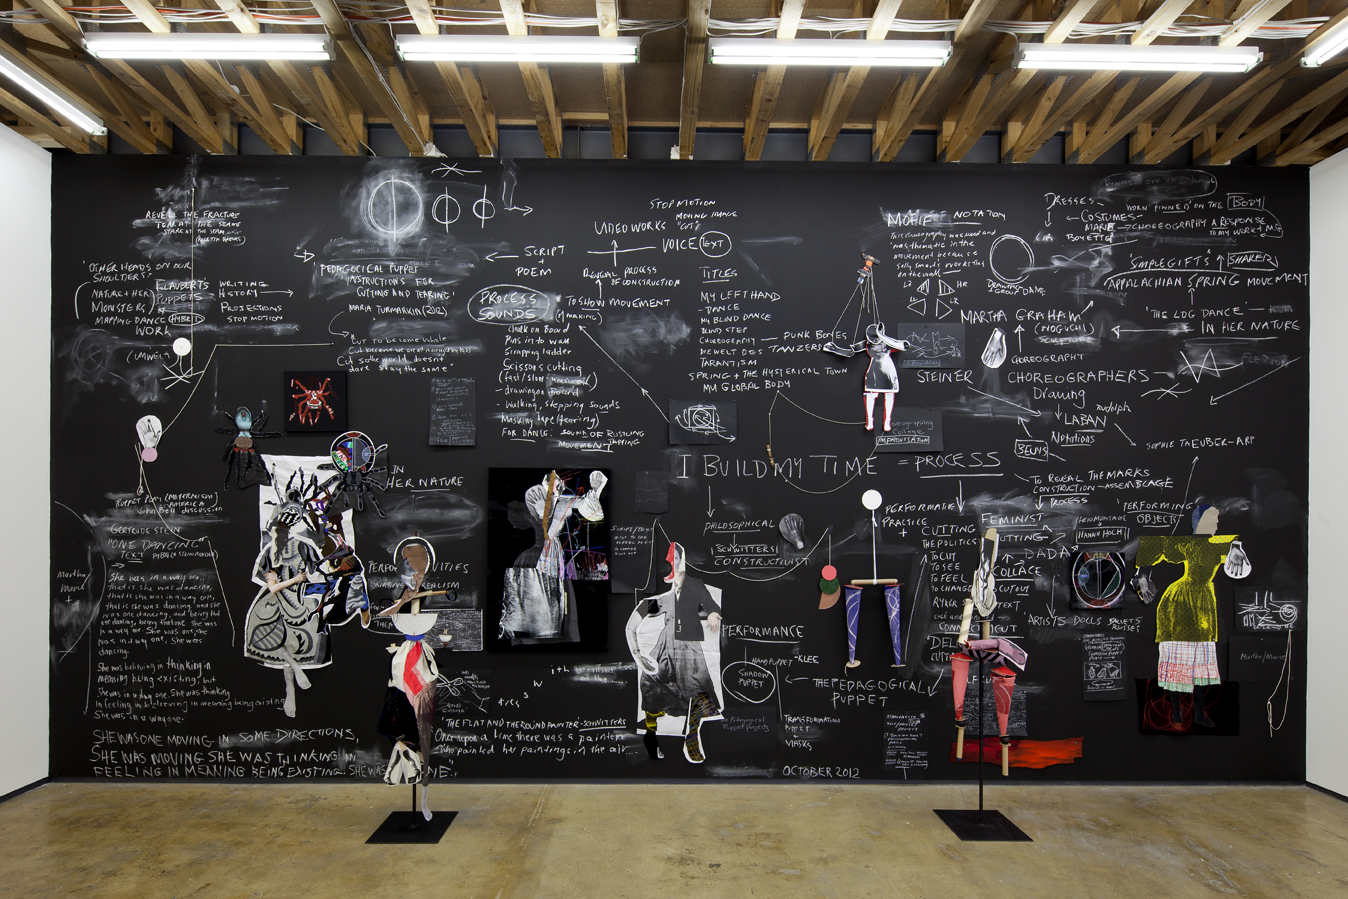 Pittura lavagna e pittura calamita  spazio alla creativit  ARC ART blog by Daniele Drigo